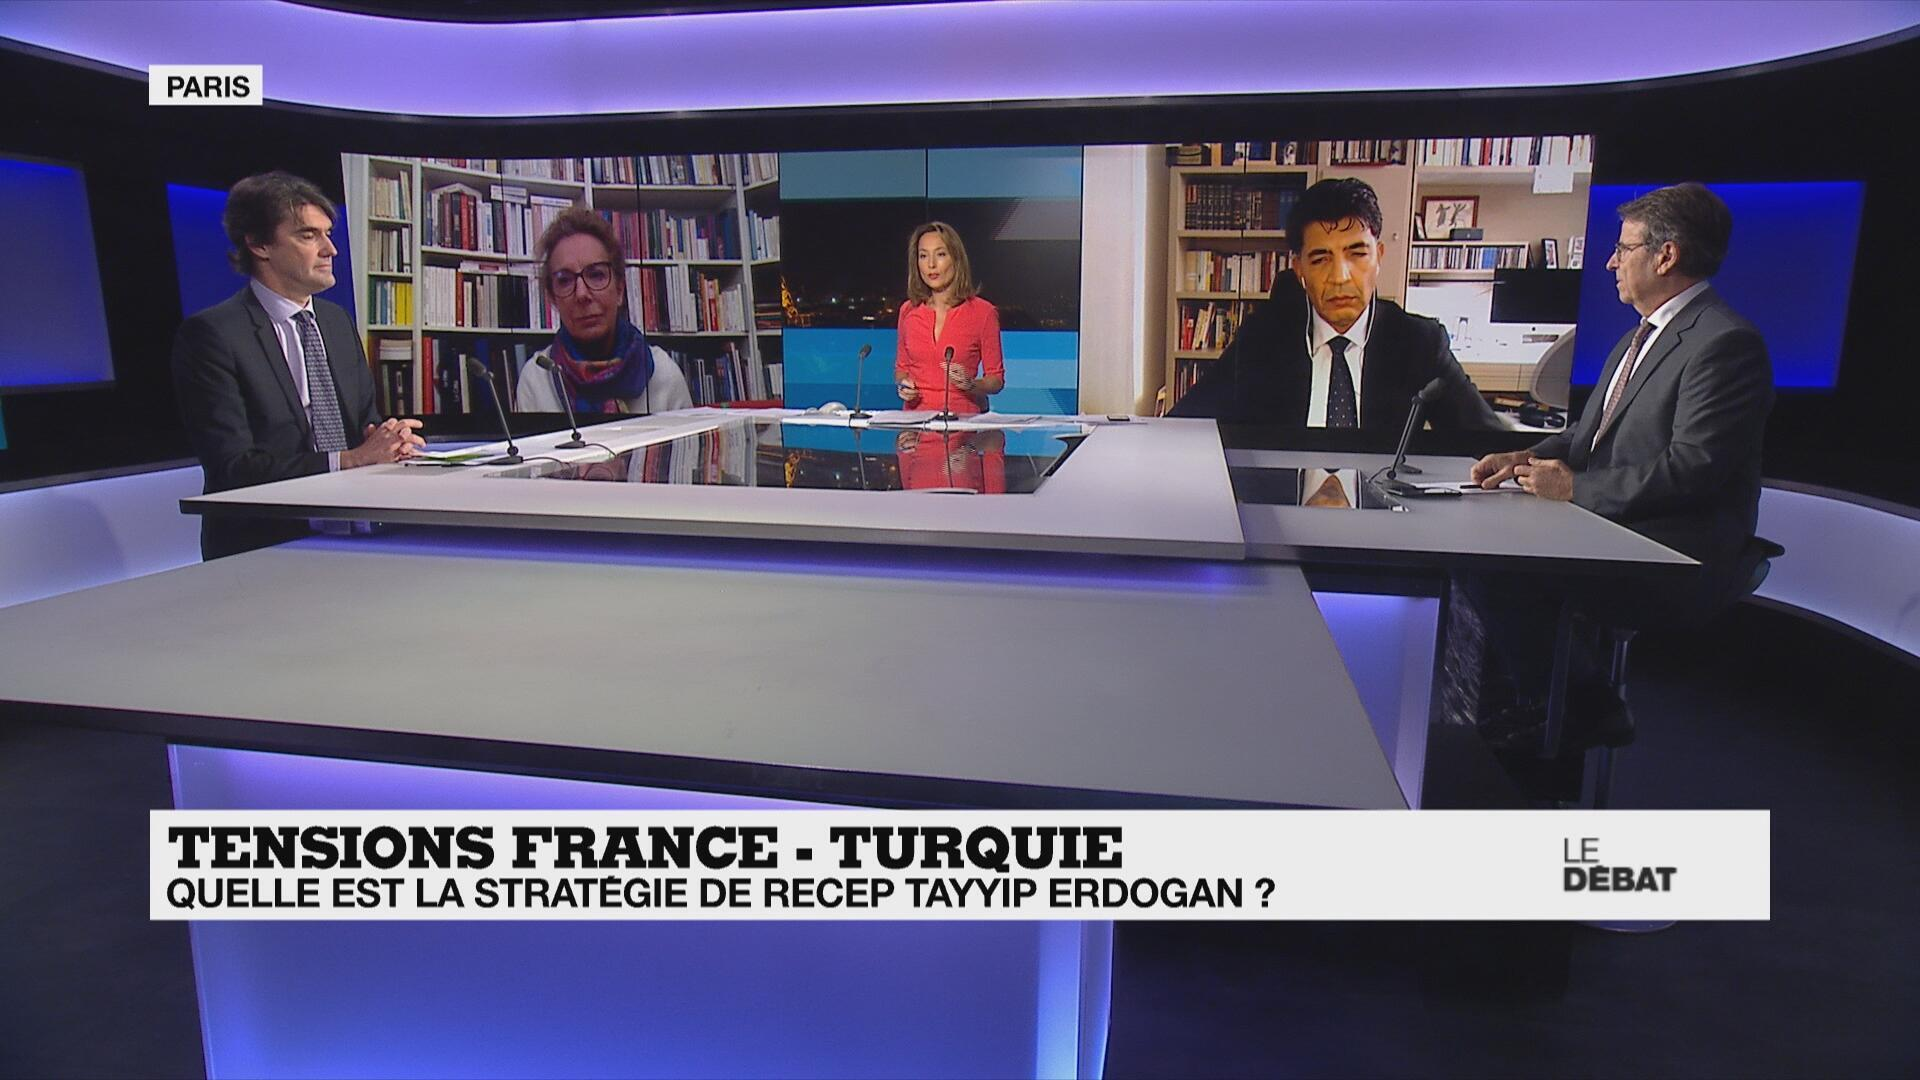 Le Débat de France 24 - lundi 26 octobre 2020